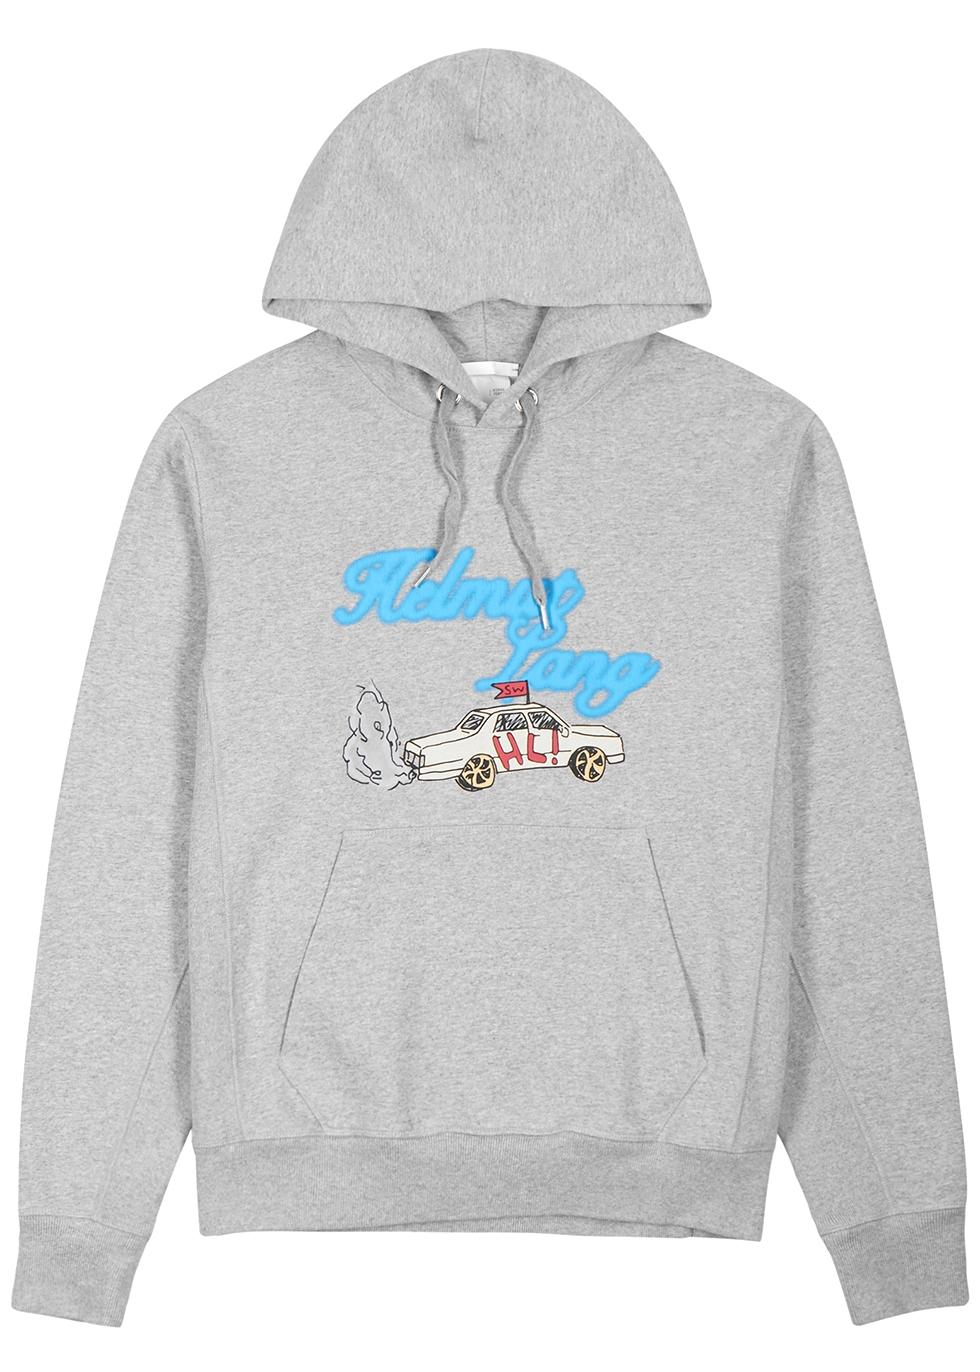 X Saintwoods Taxi grey cotton sweatshirt